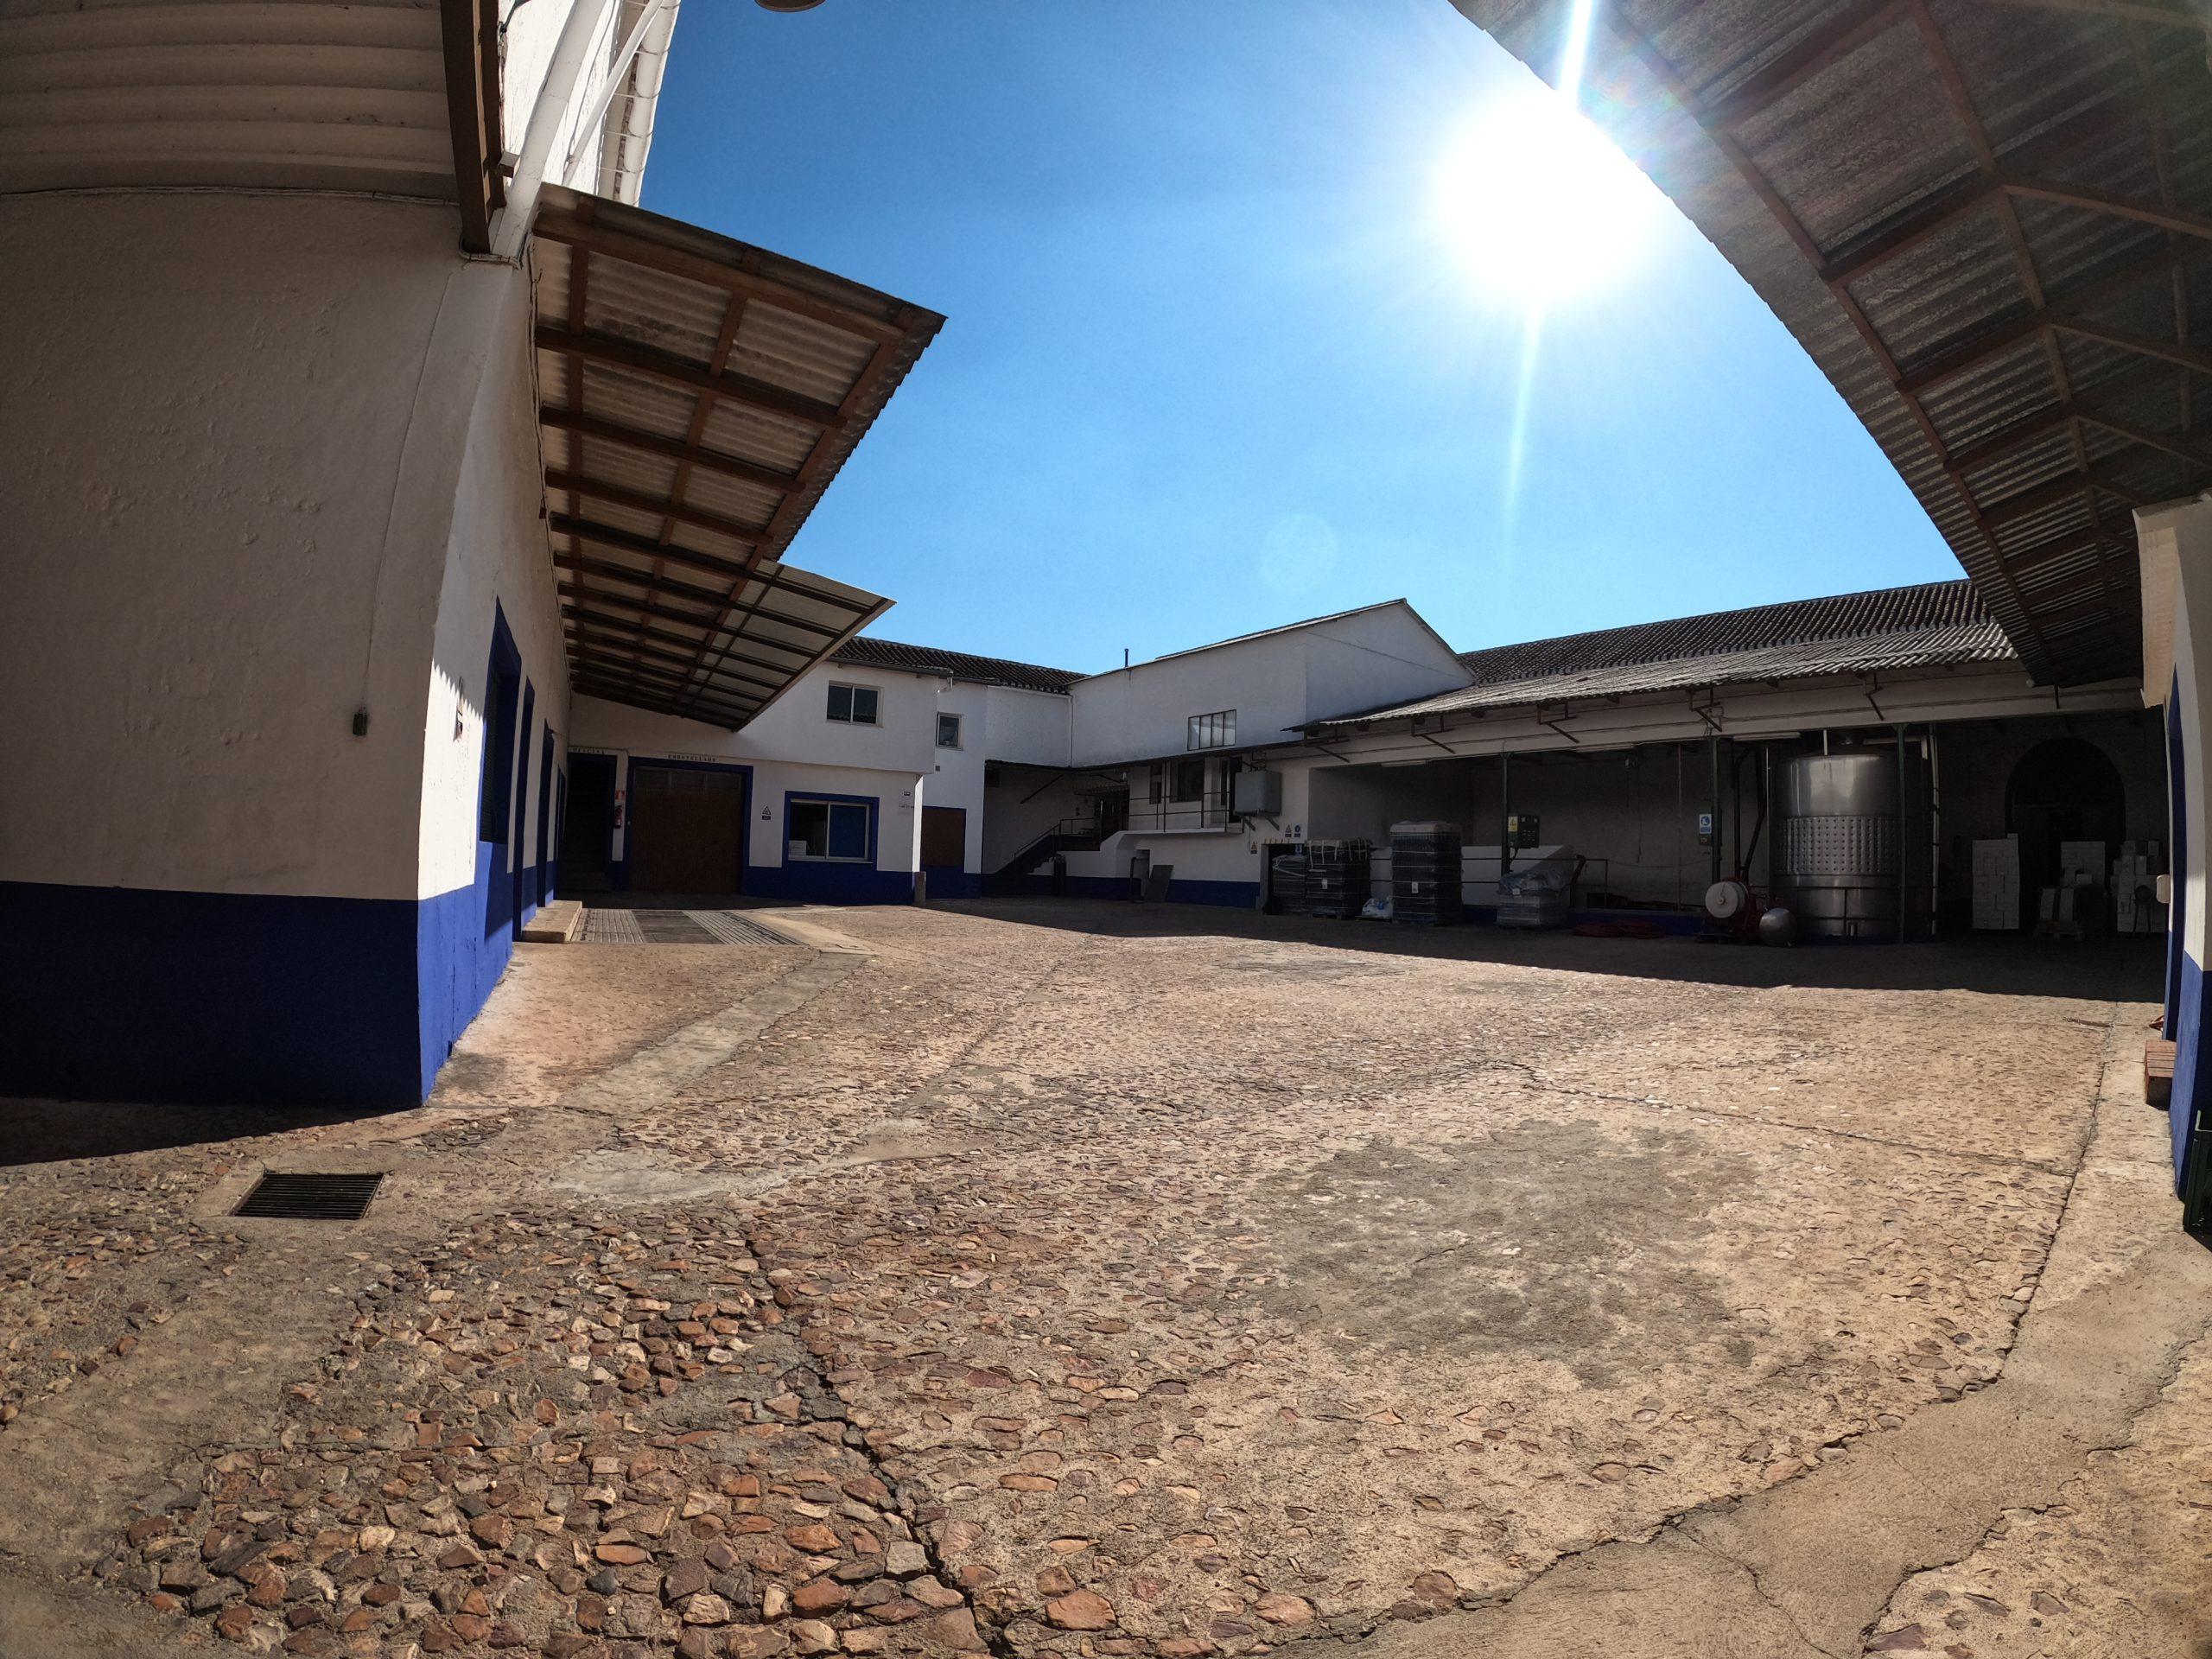 Vino De Tinaja De Barro Tradicional | Sobre Nosotros